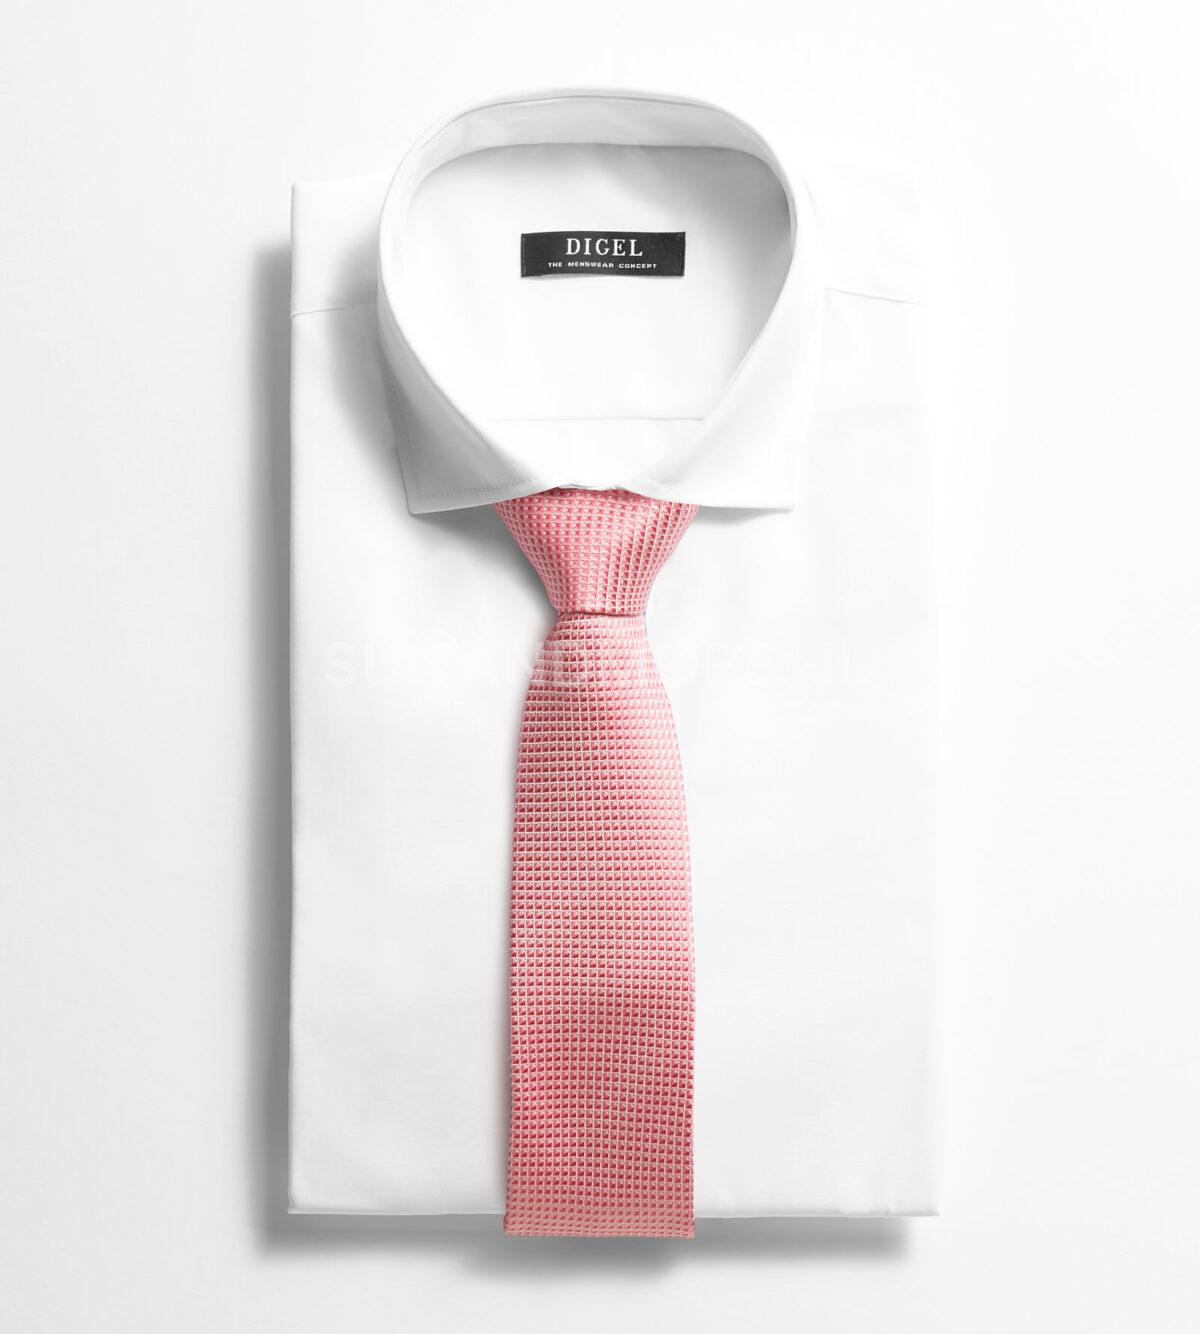 olymp-rozsaszin-strukturalt-selyem-nyakkendo-1798-00-81-02